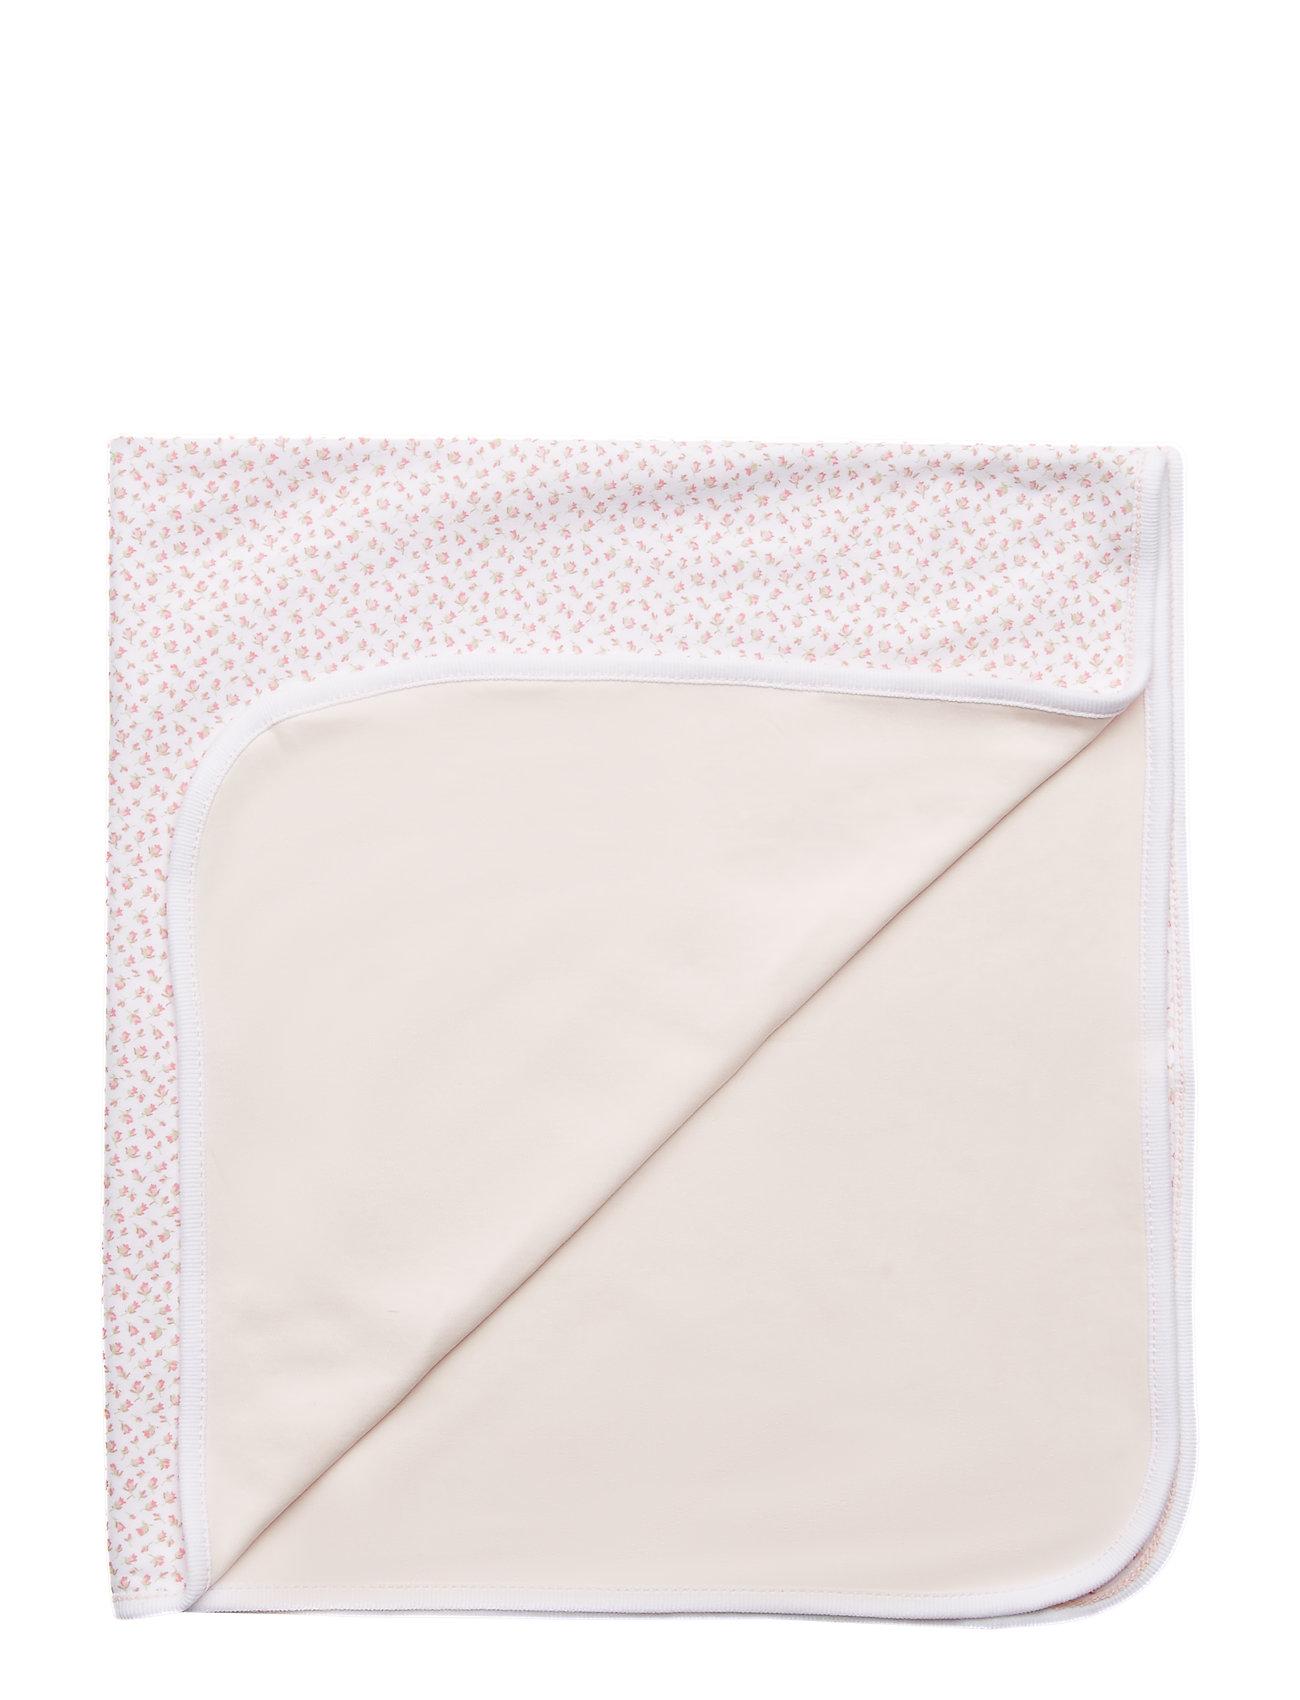 Ralph Lauren Baby Floral-Print Cotton Blanket - WHITE MULTI FLO